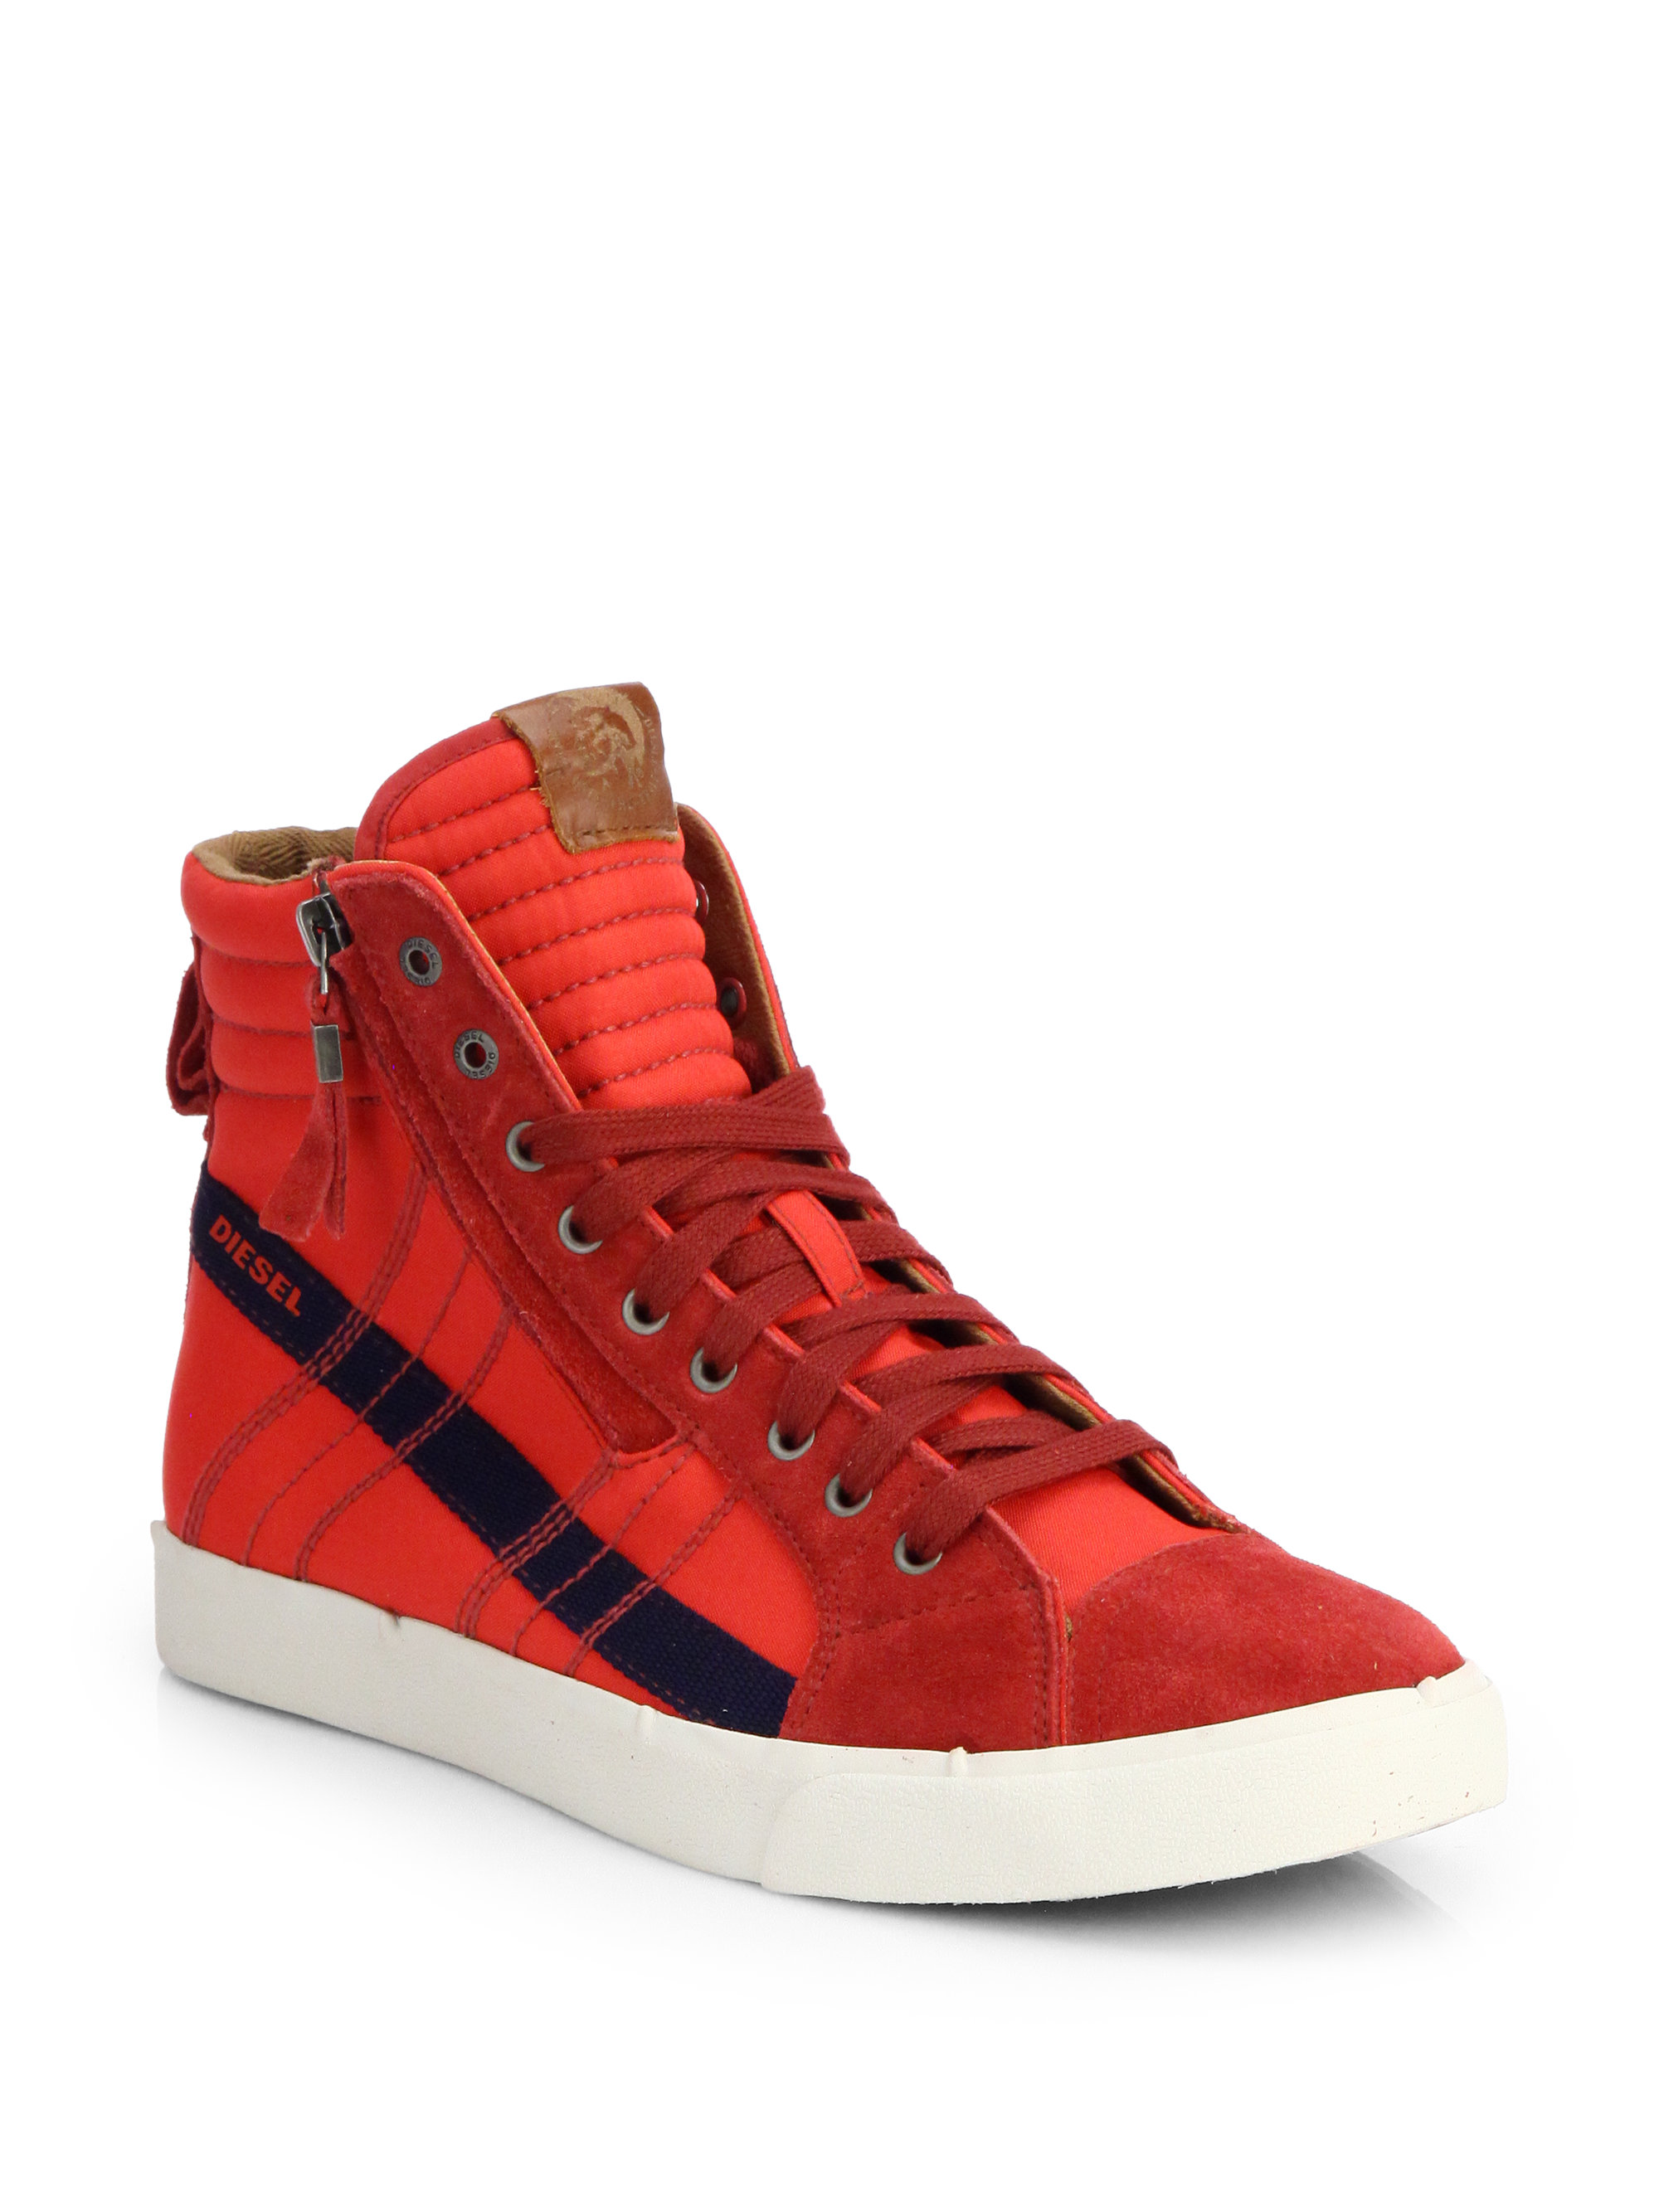 Rubber Rings For Men >> Diesel Dstring Striped Hightop Sneakers in Red for Men   Lyst